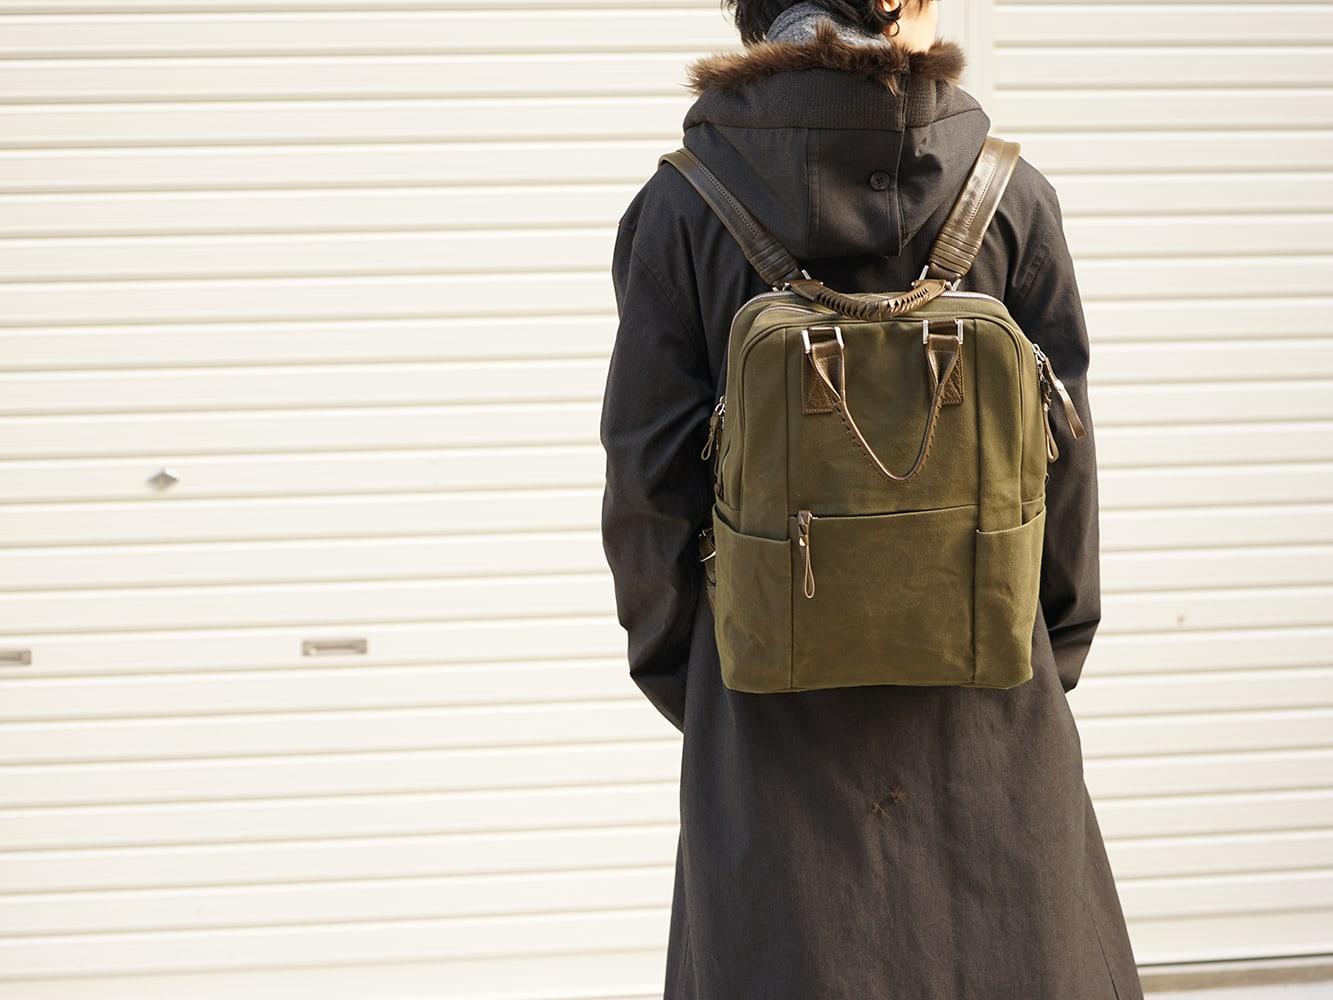 Yohji Yamamoto High-necked leather jacket Style 08